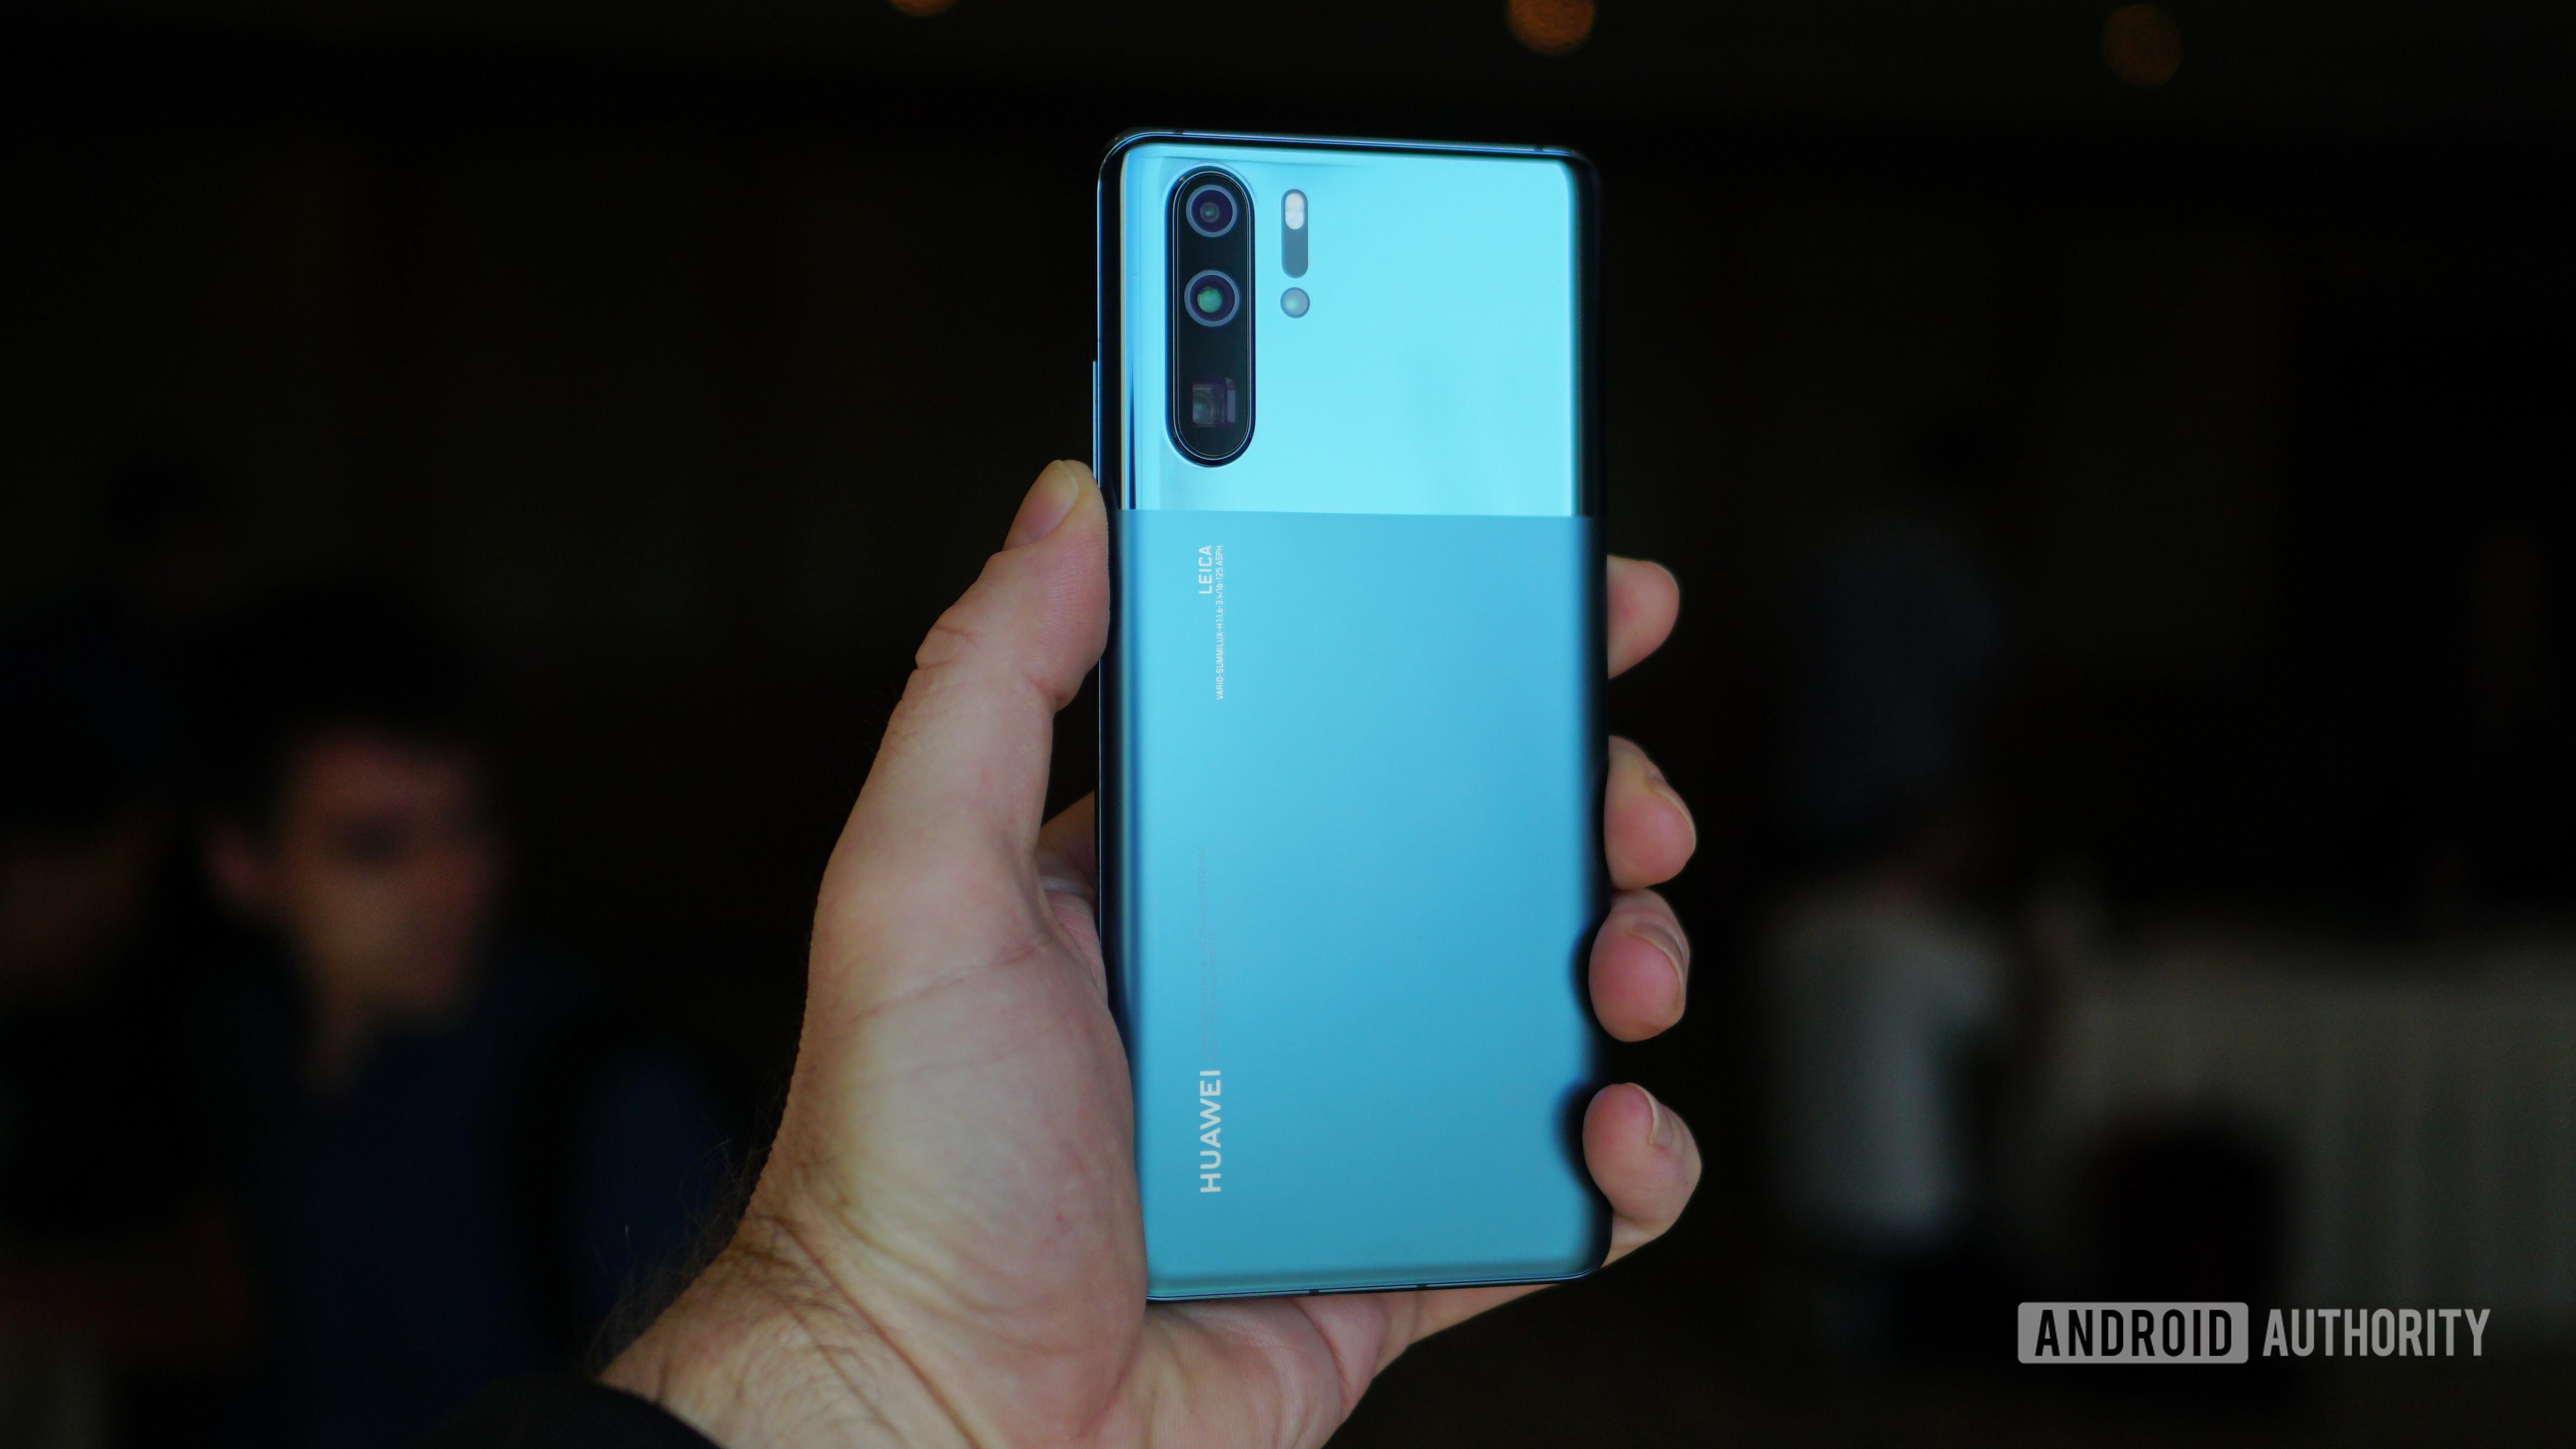 Huawei P30 Pro in misty blue in hand dark barckground